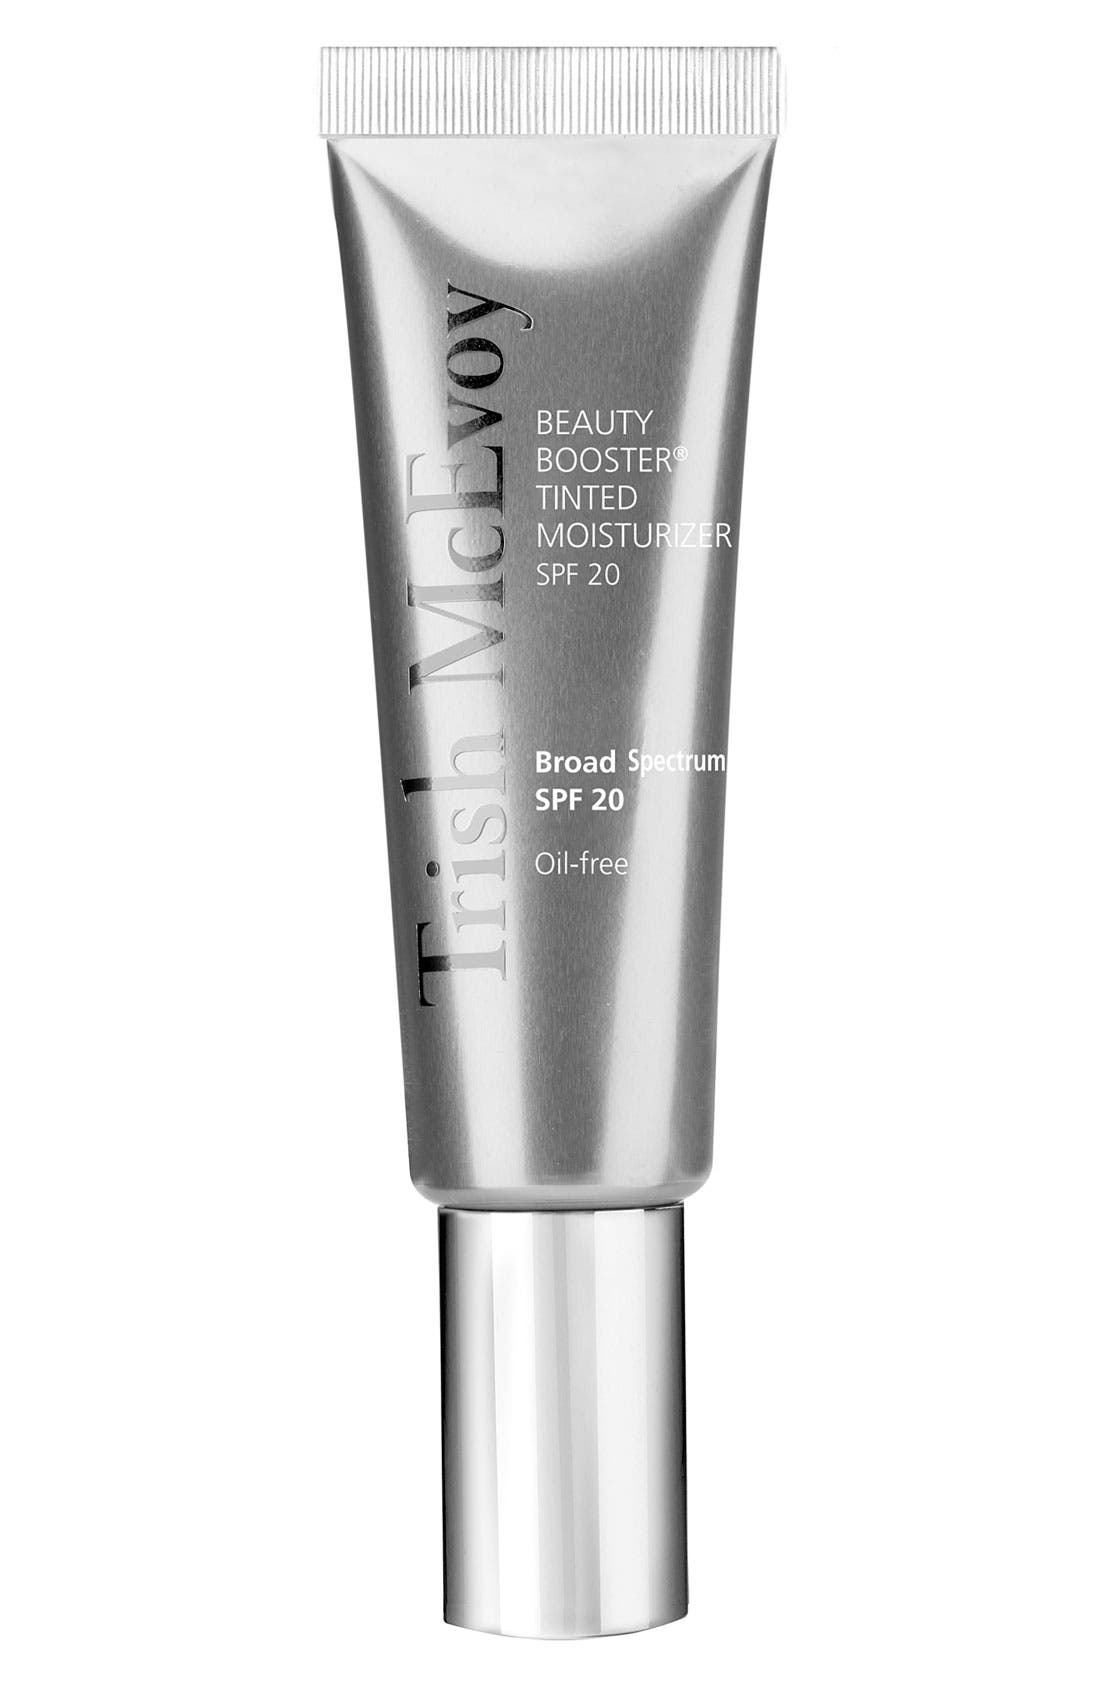 Trish McEvoy 'Beauty Booster®' Tinted Moisturizer Broad Spectrum SPF 20